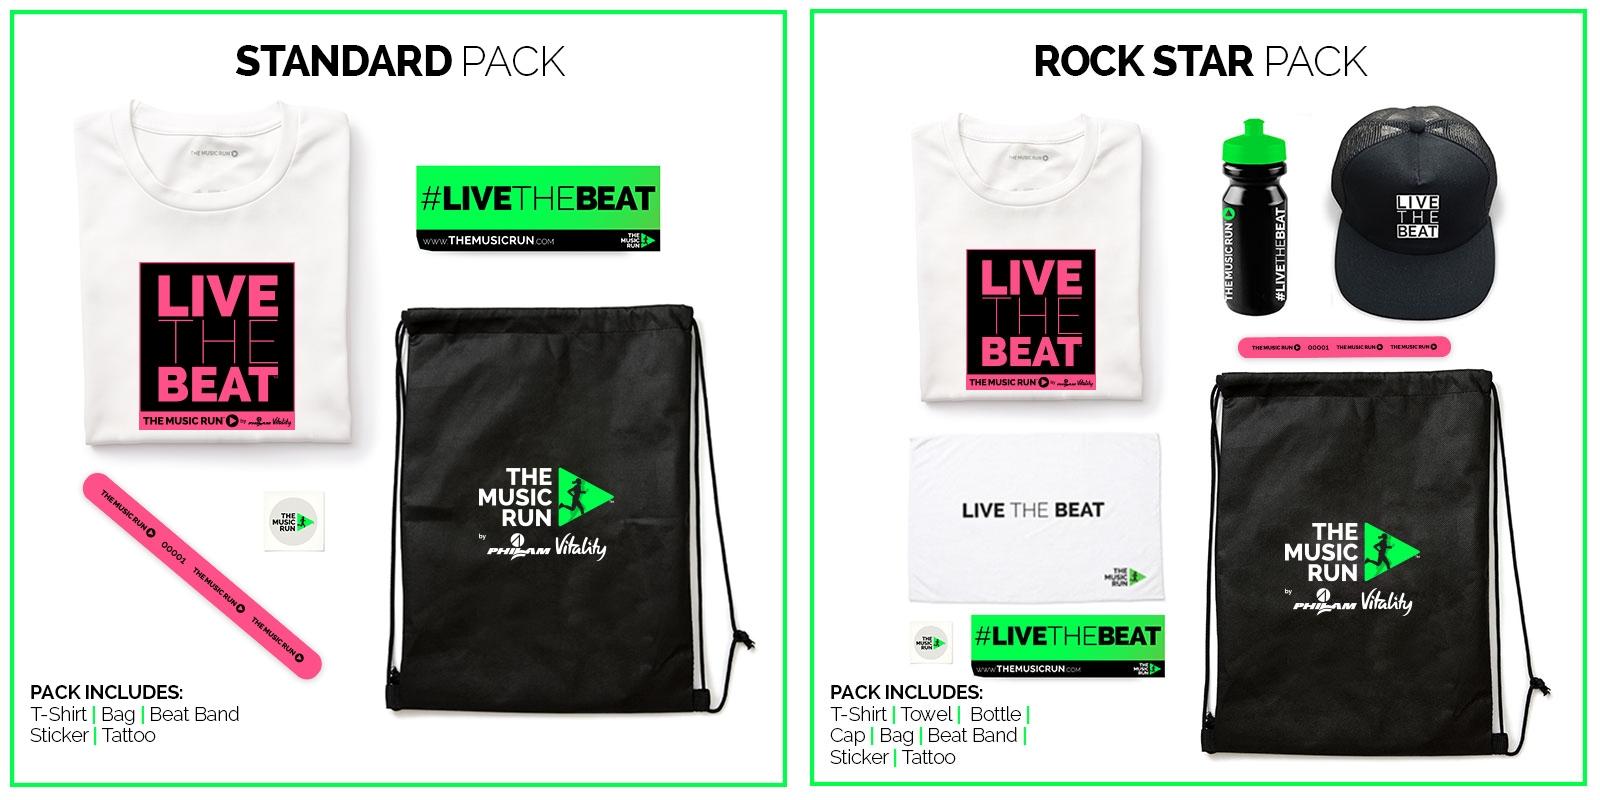 event-packs